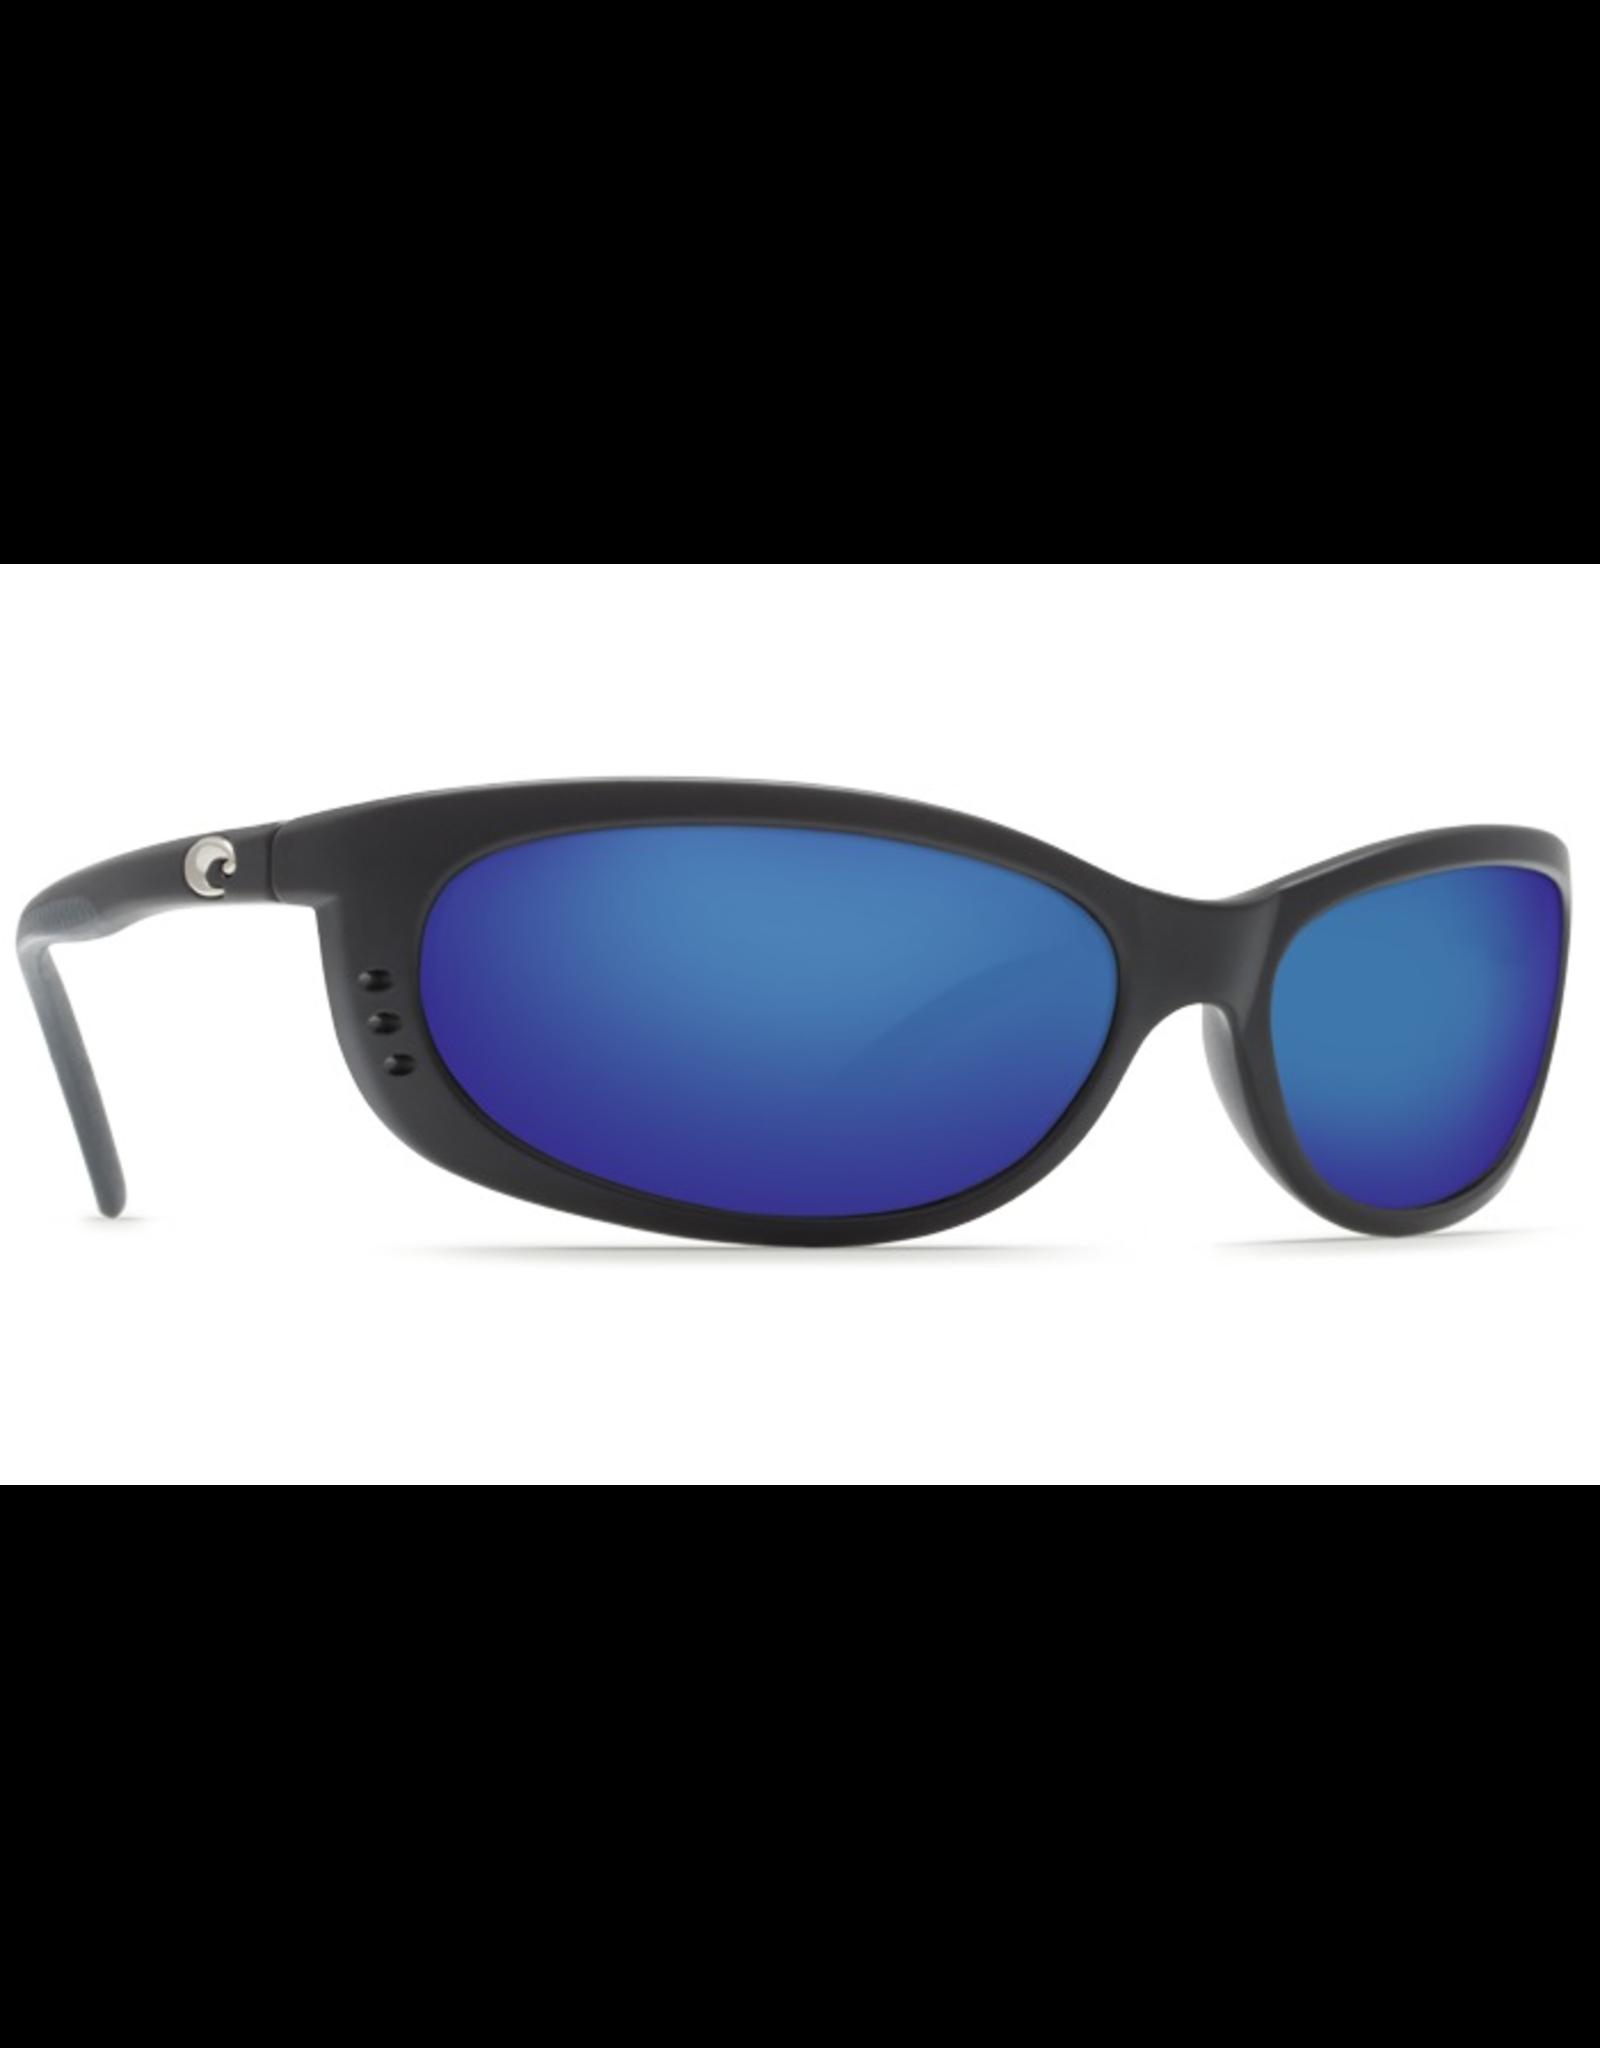 COSTA FATHOM MATTE BLACK BLUE MIRROR LENS 580G